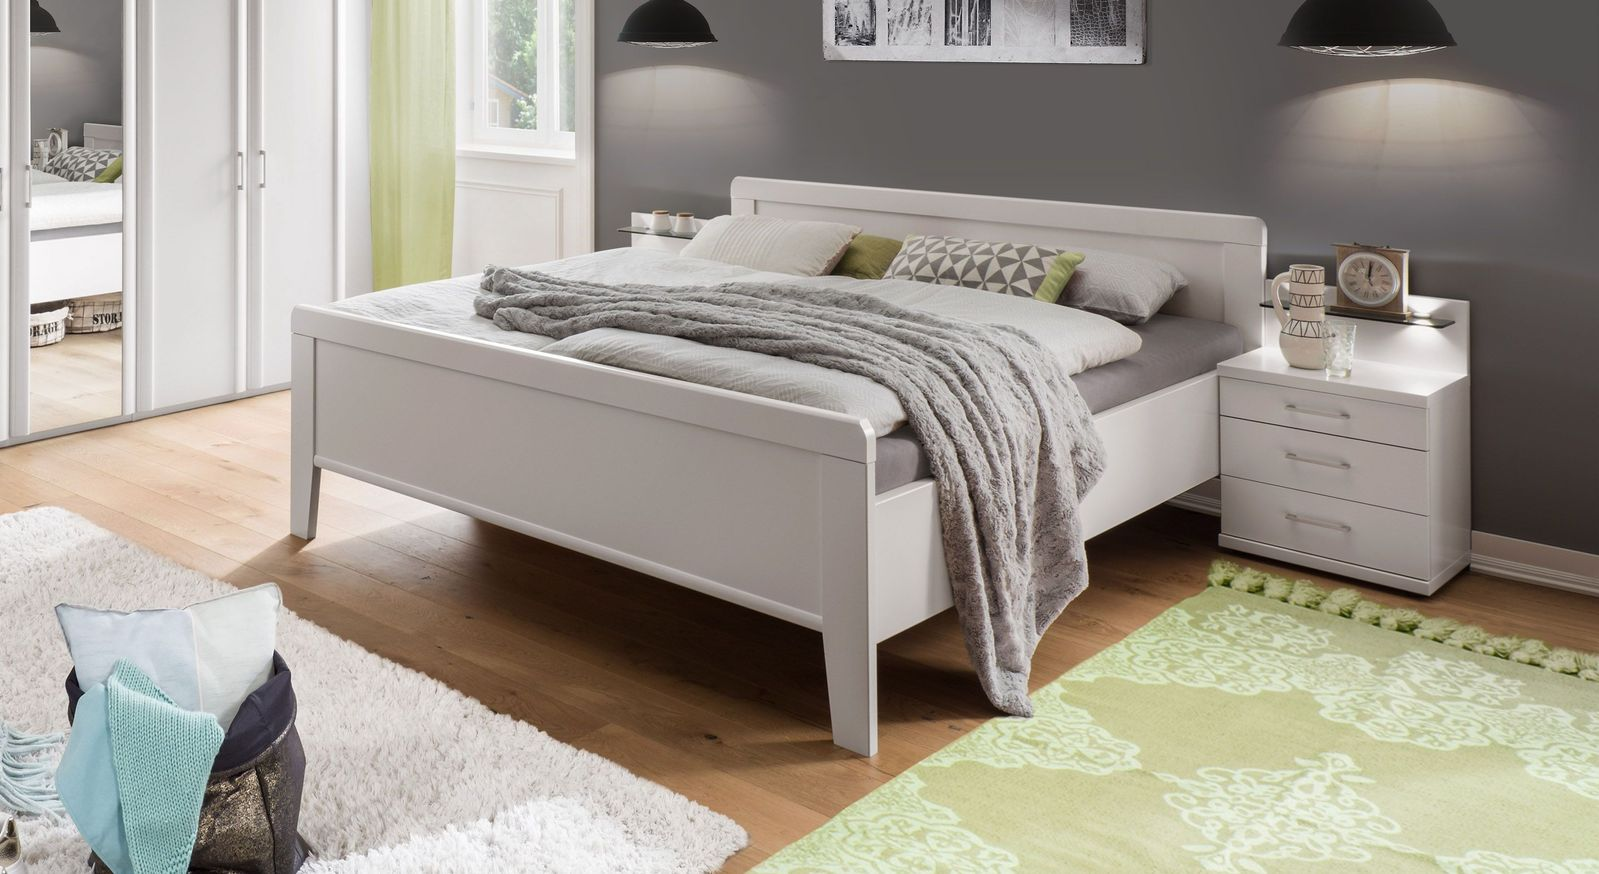 Komfort-Doppelbett Calimera inklusive Kopf- und  Fußteil